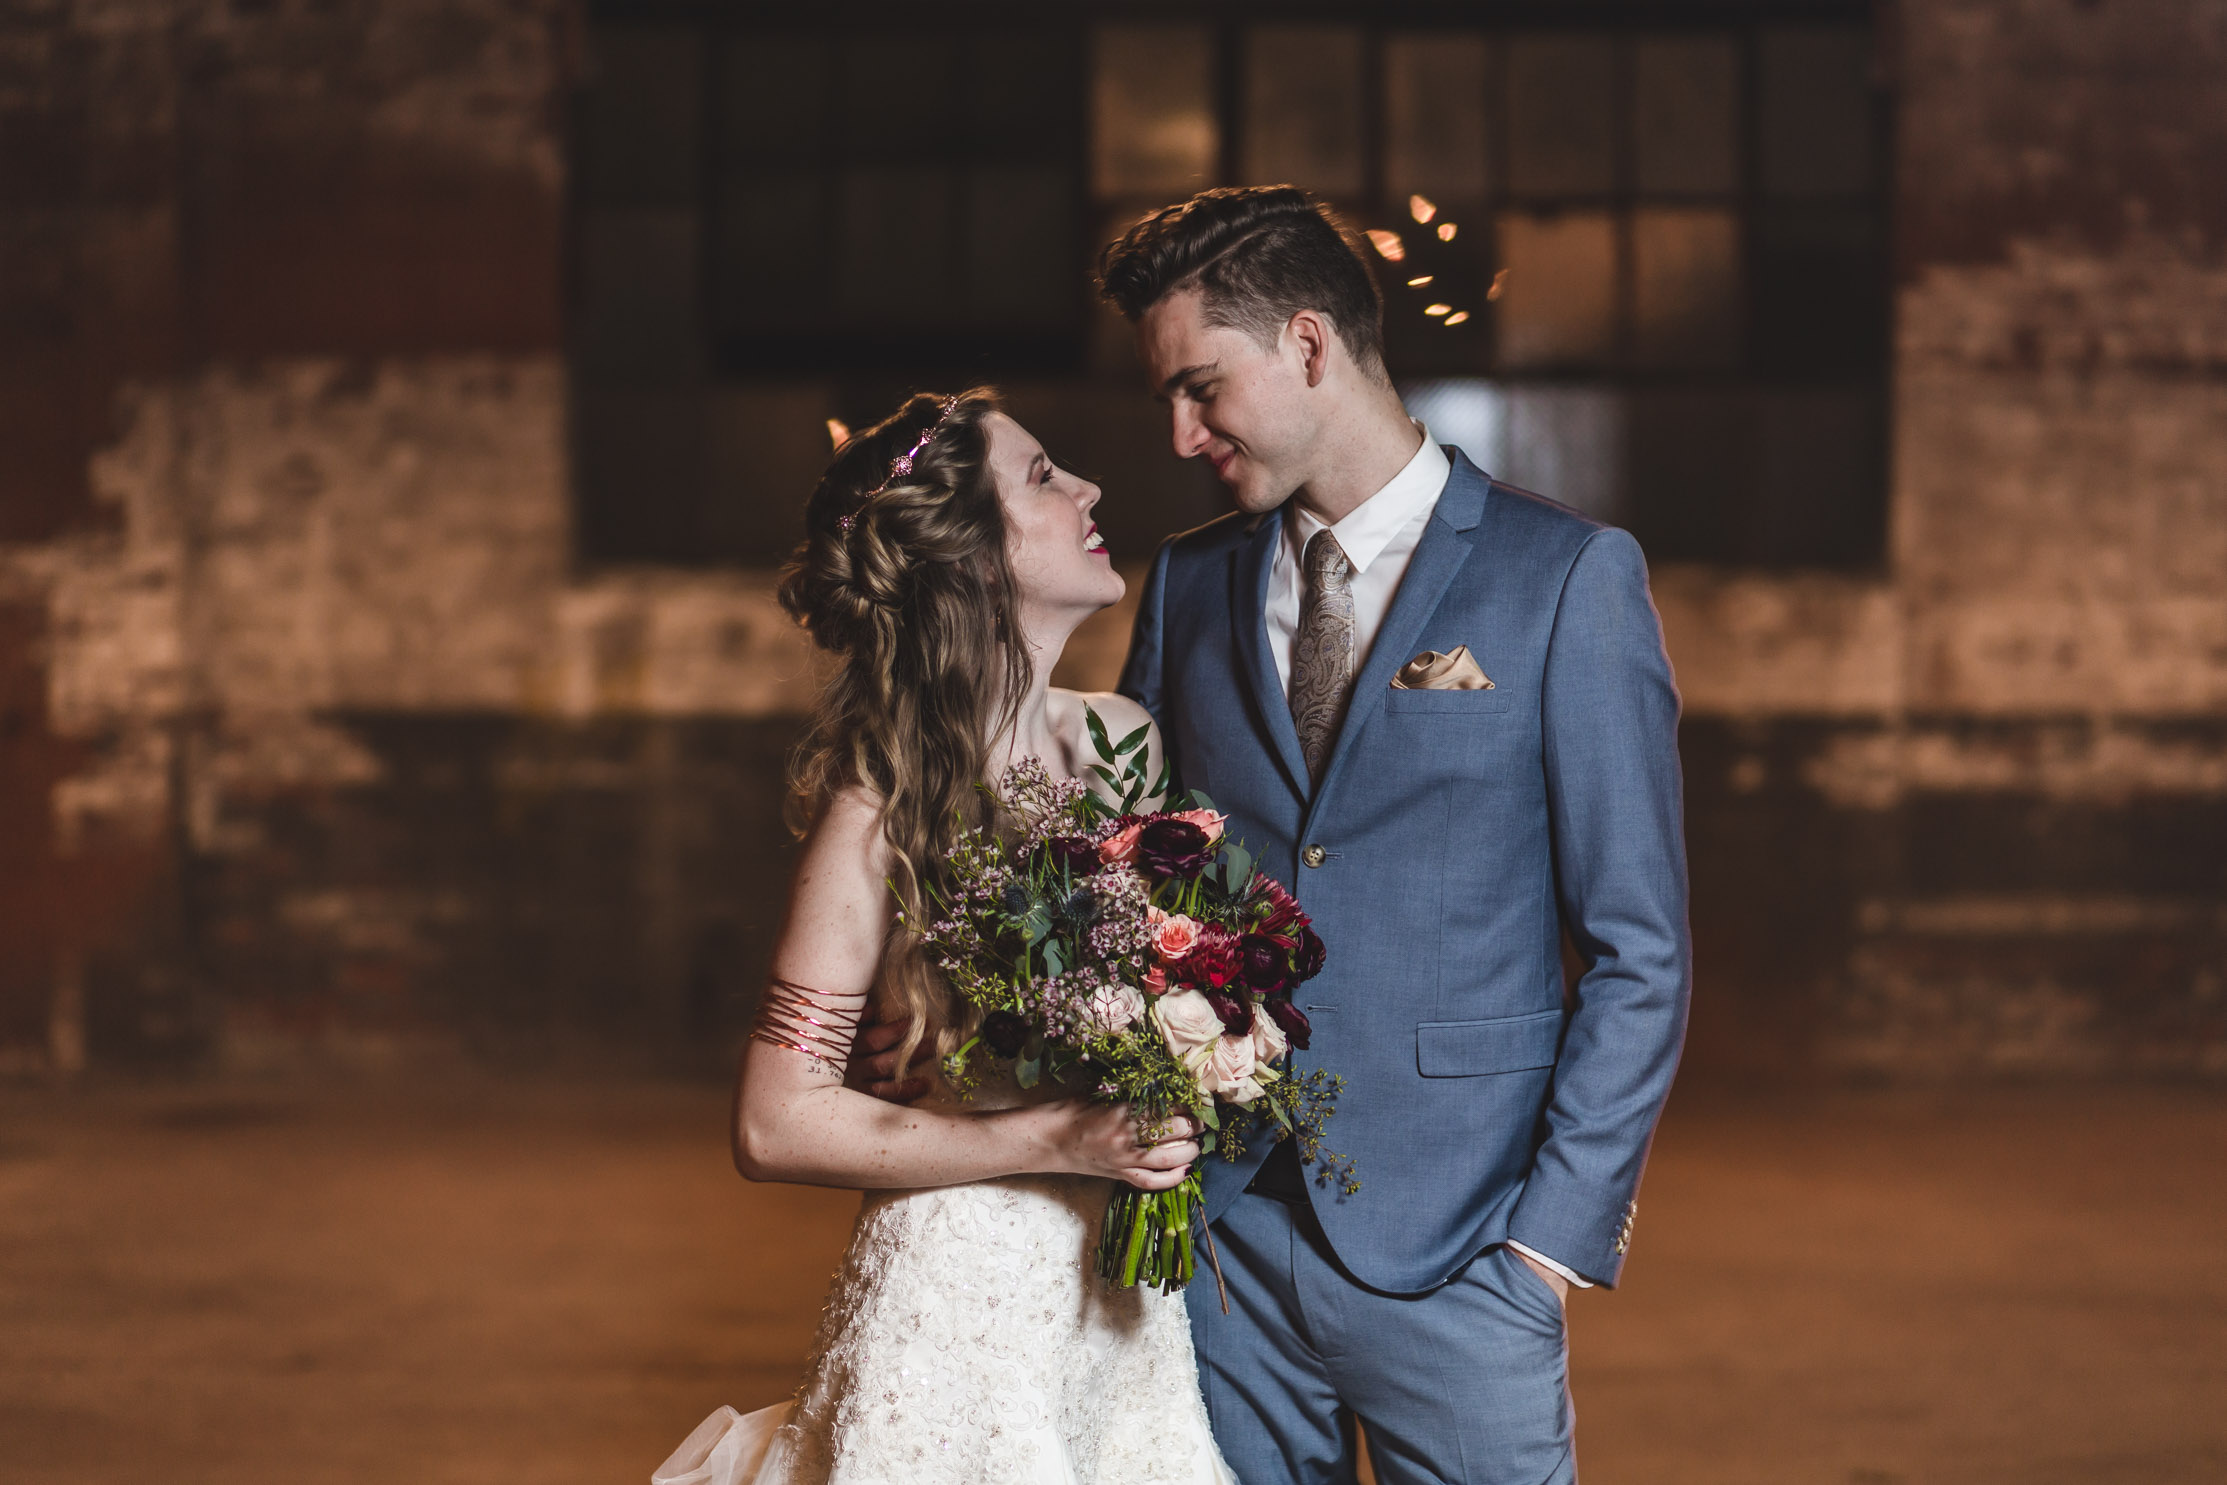 Adam-Szrmack-The-Glass-Factory-Wedding-130.jpg